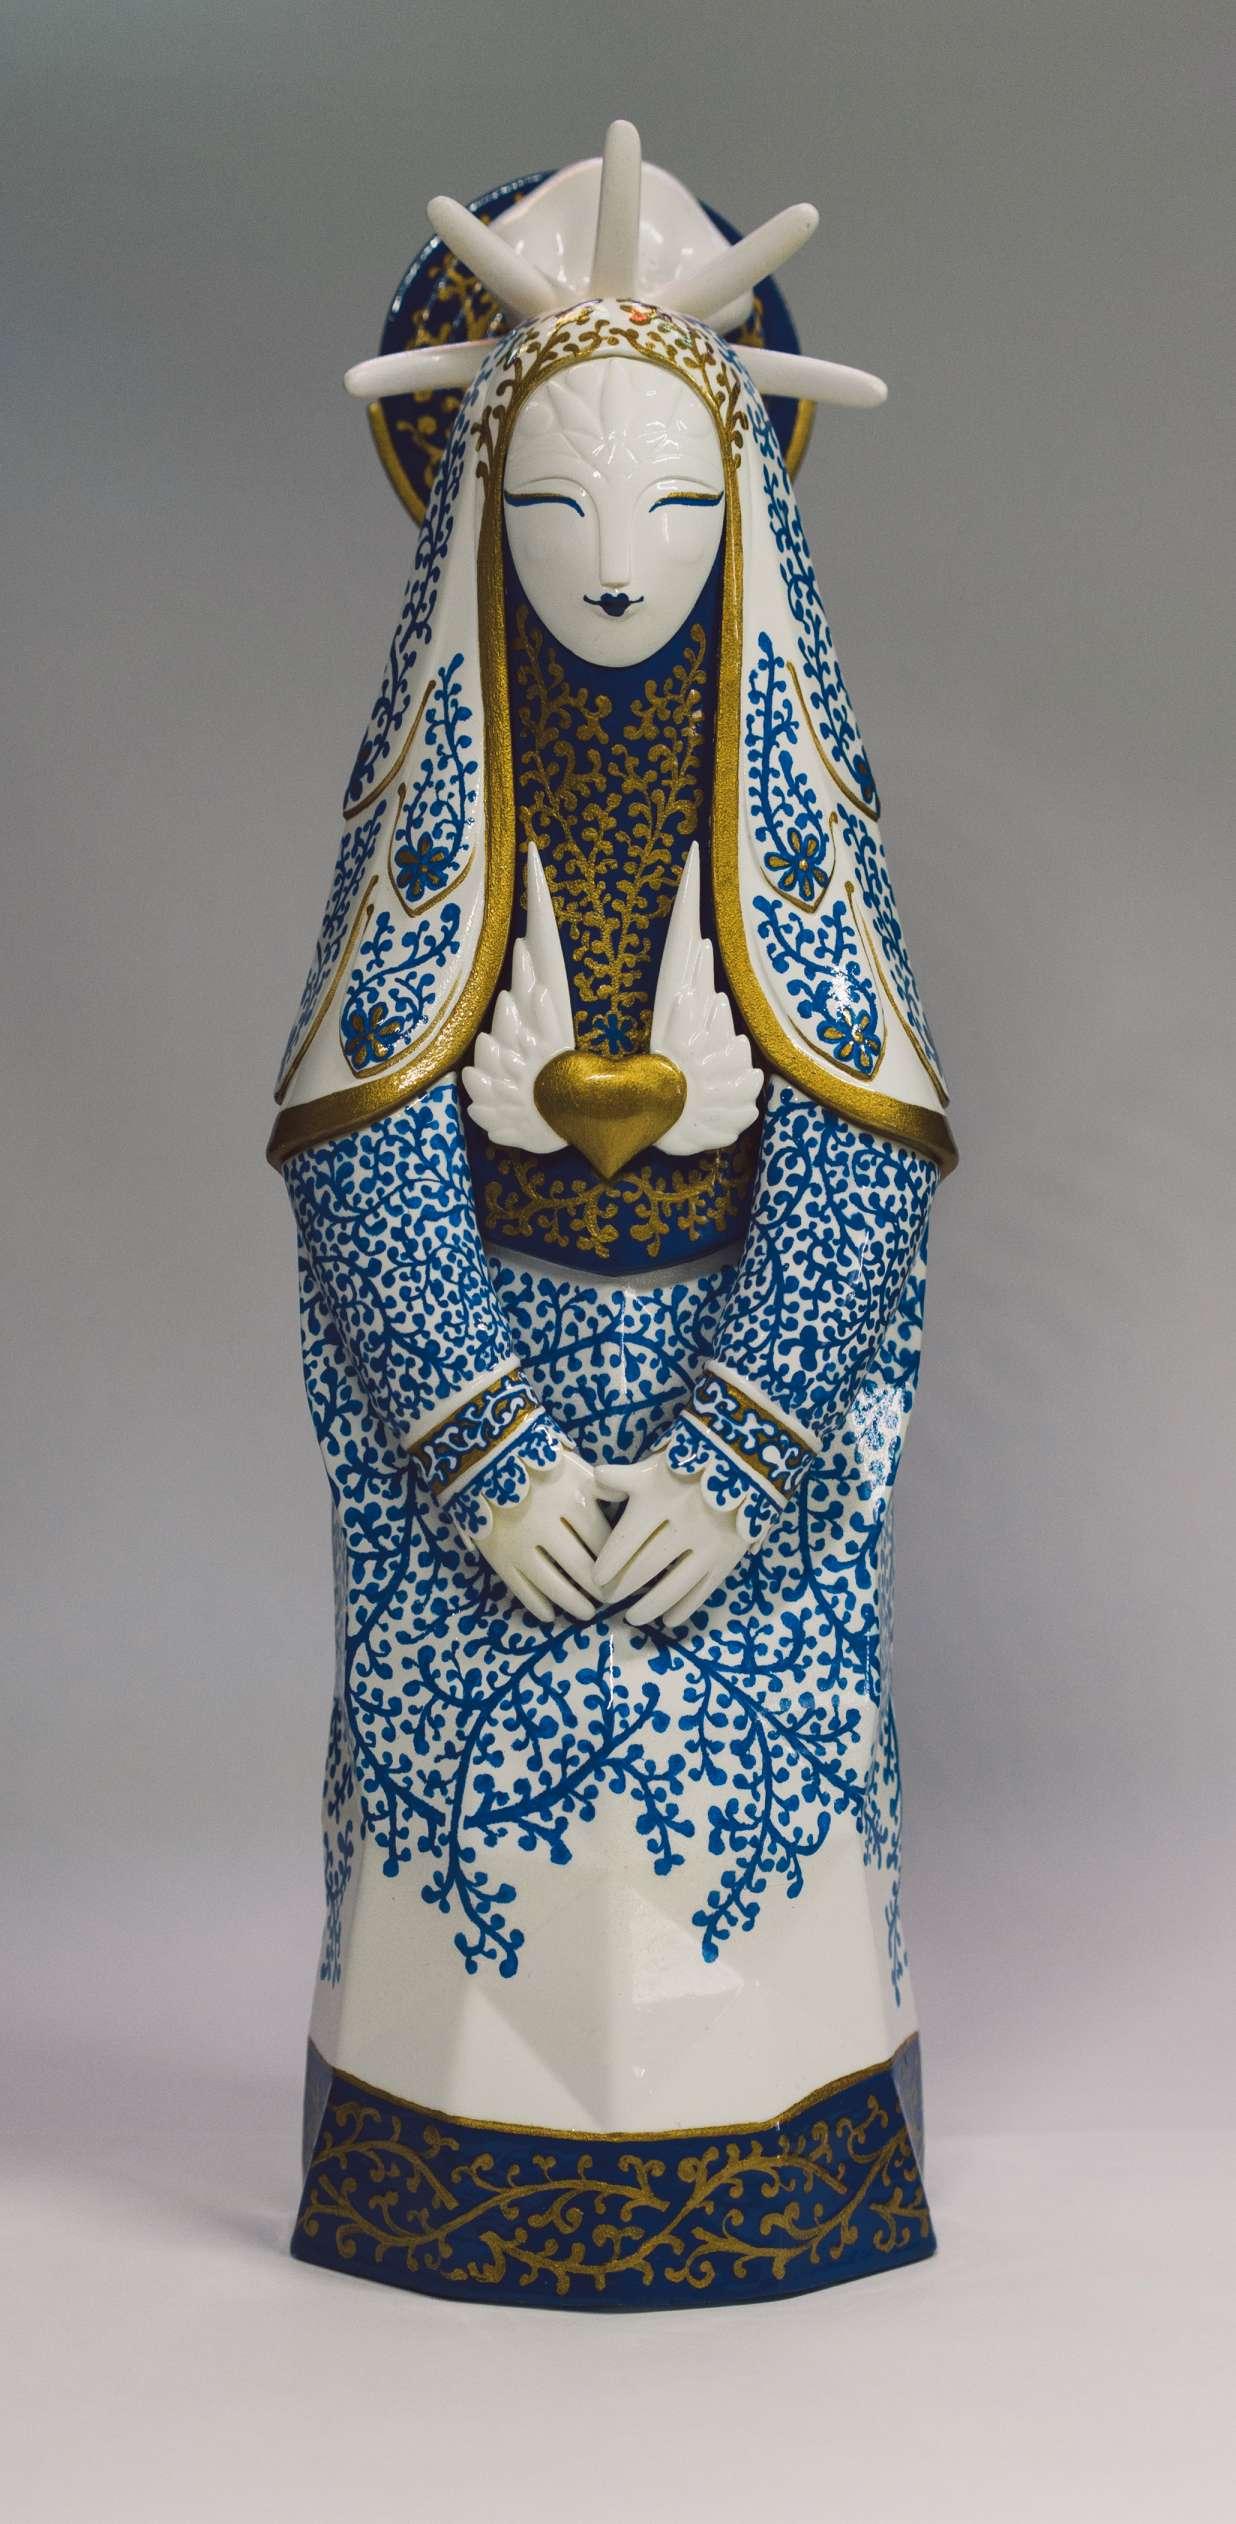 Inuit Goddess Customizado por Cristina Ravenna